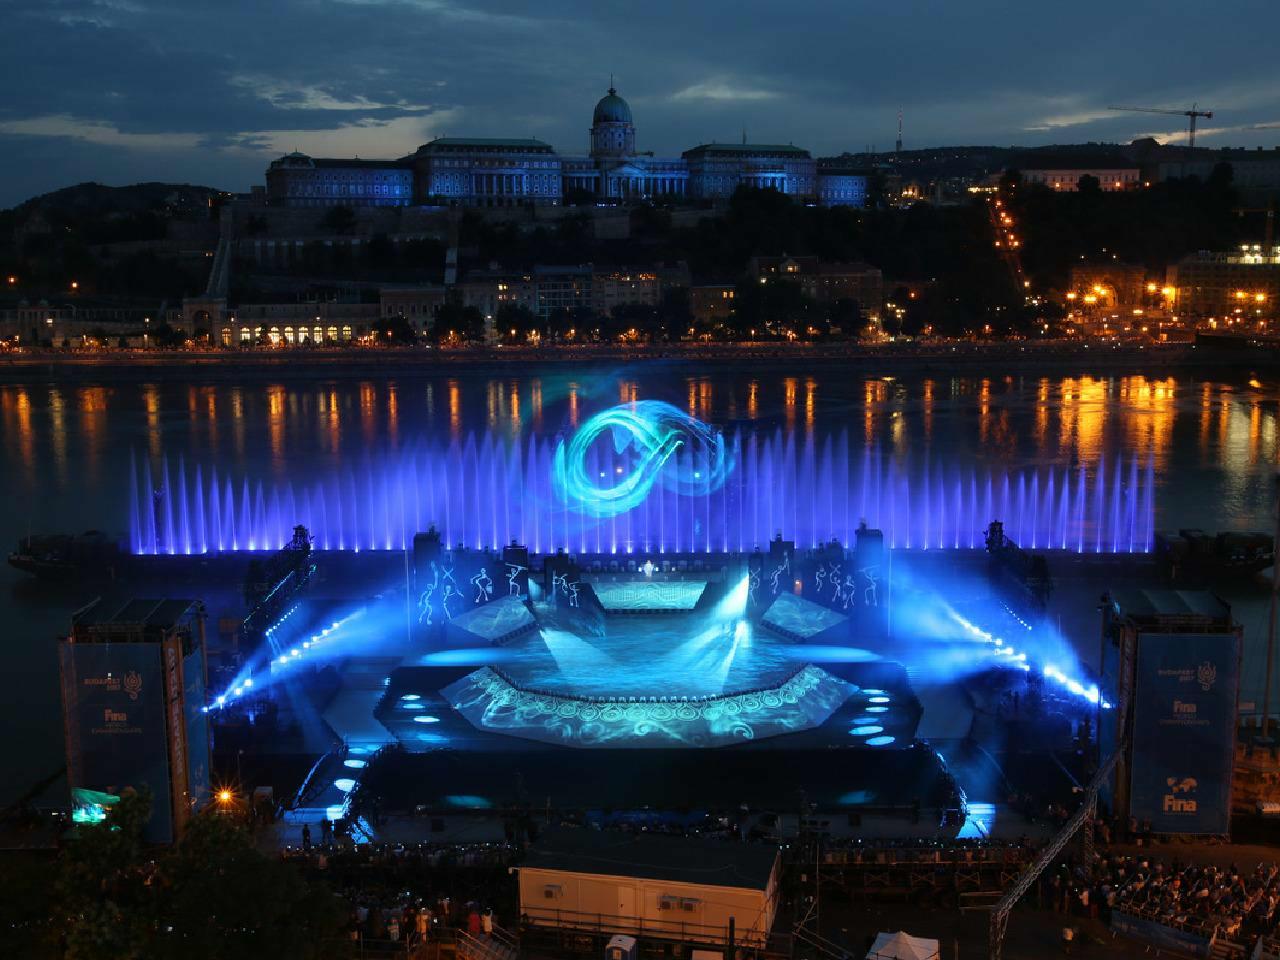 17th FINA World Aquatic Championships